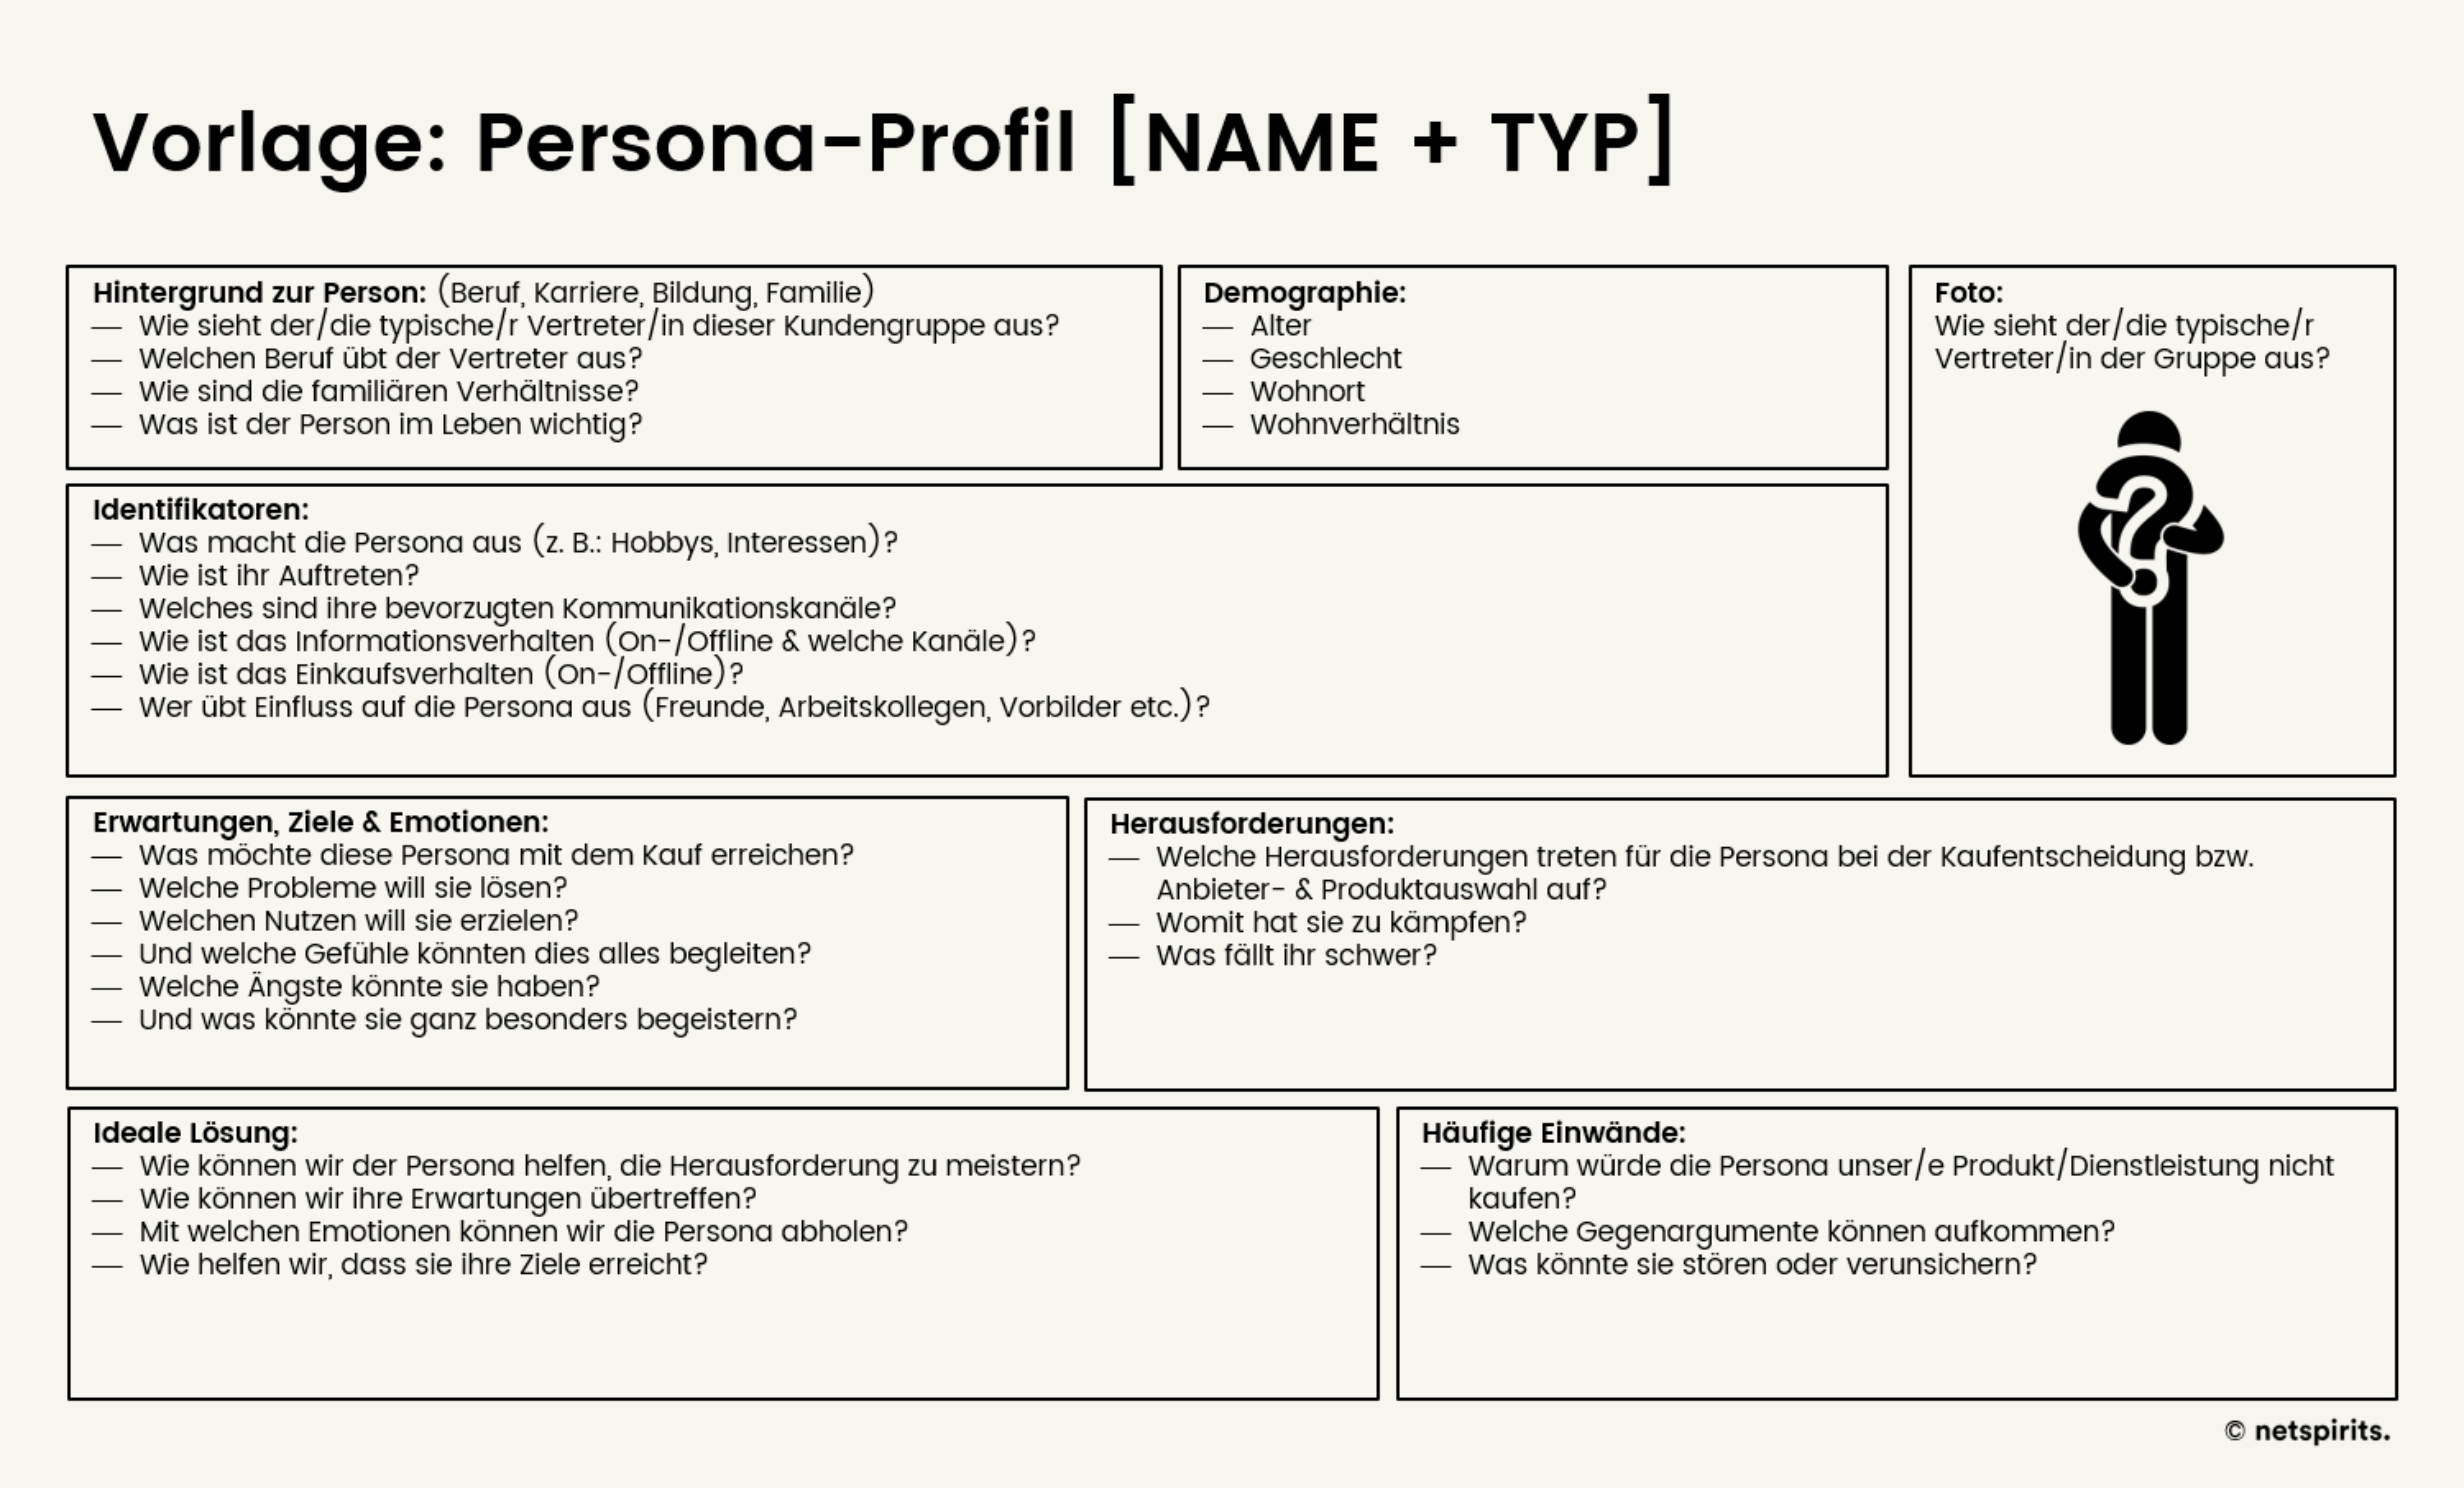 Vorlage Persona-Profil